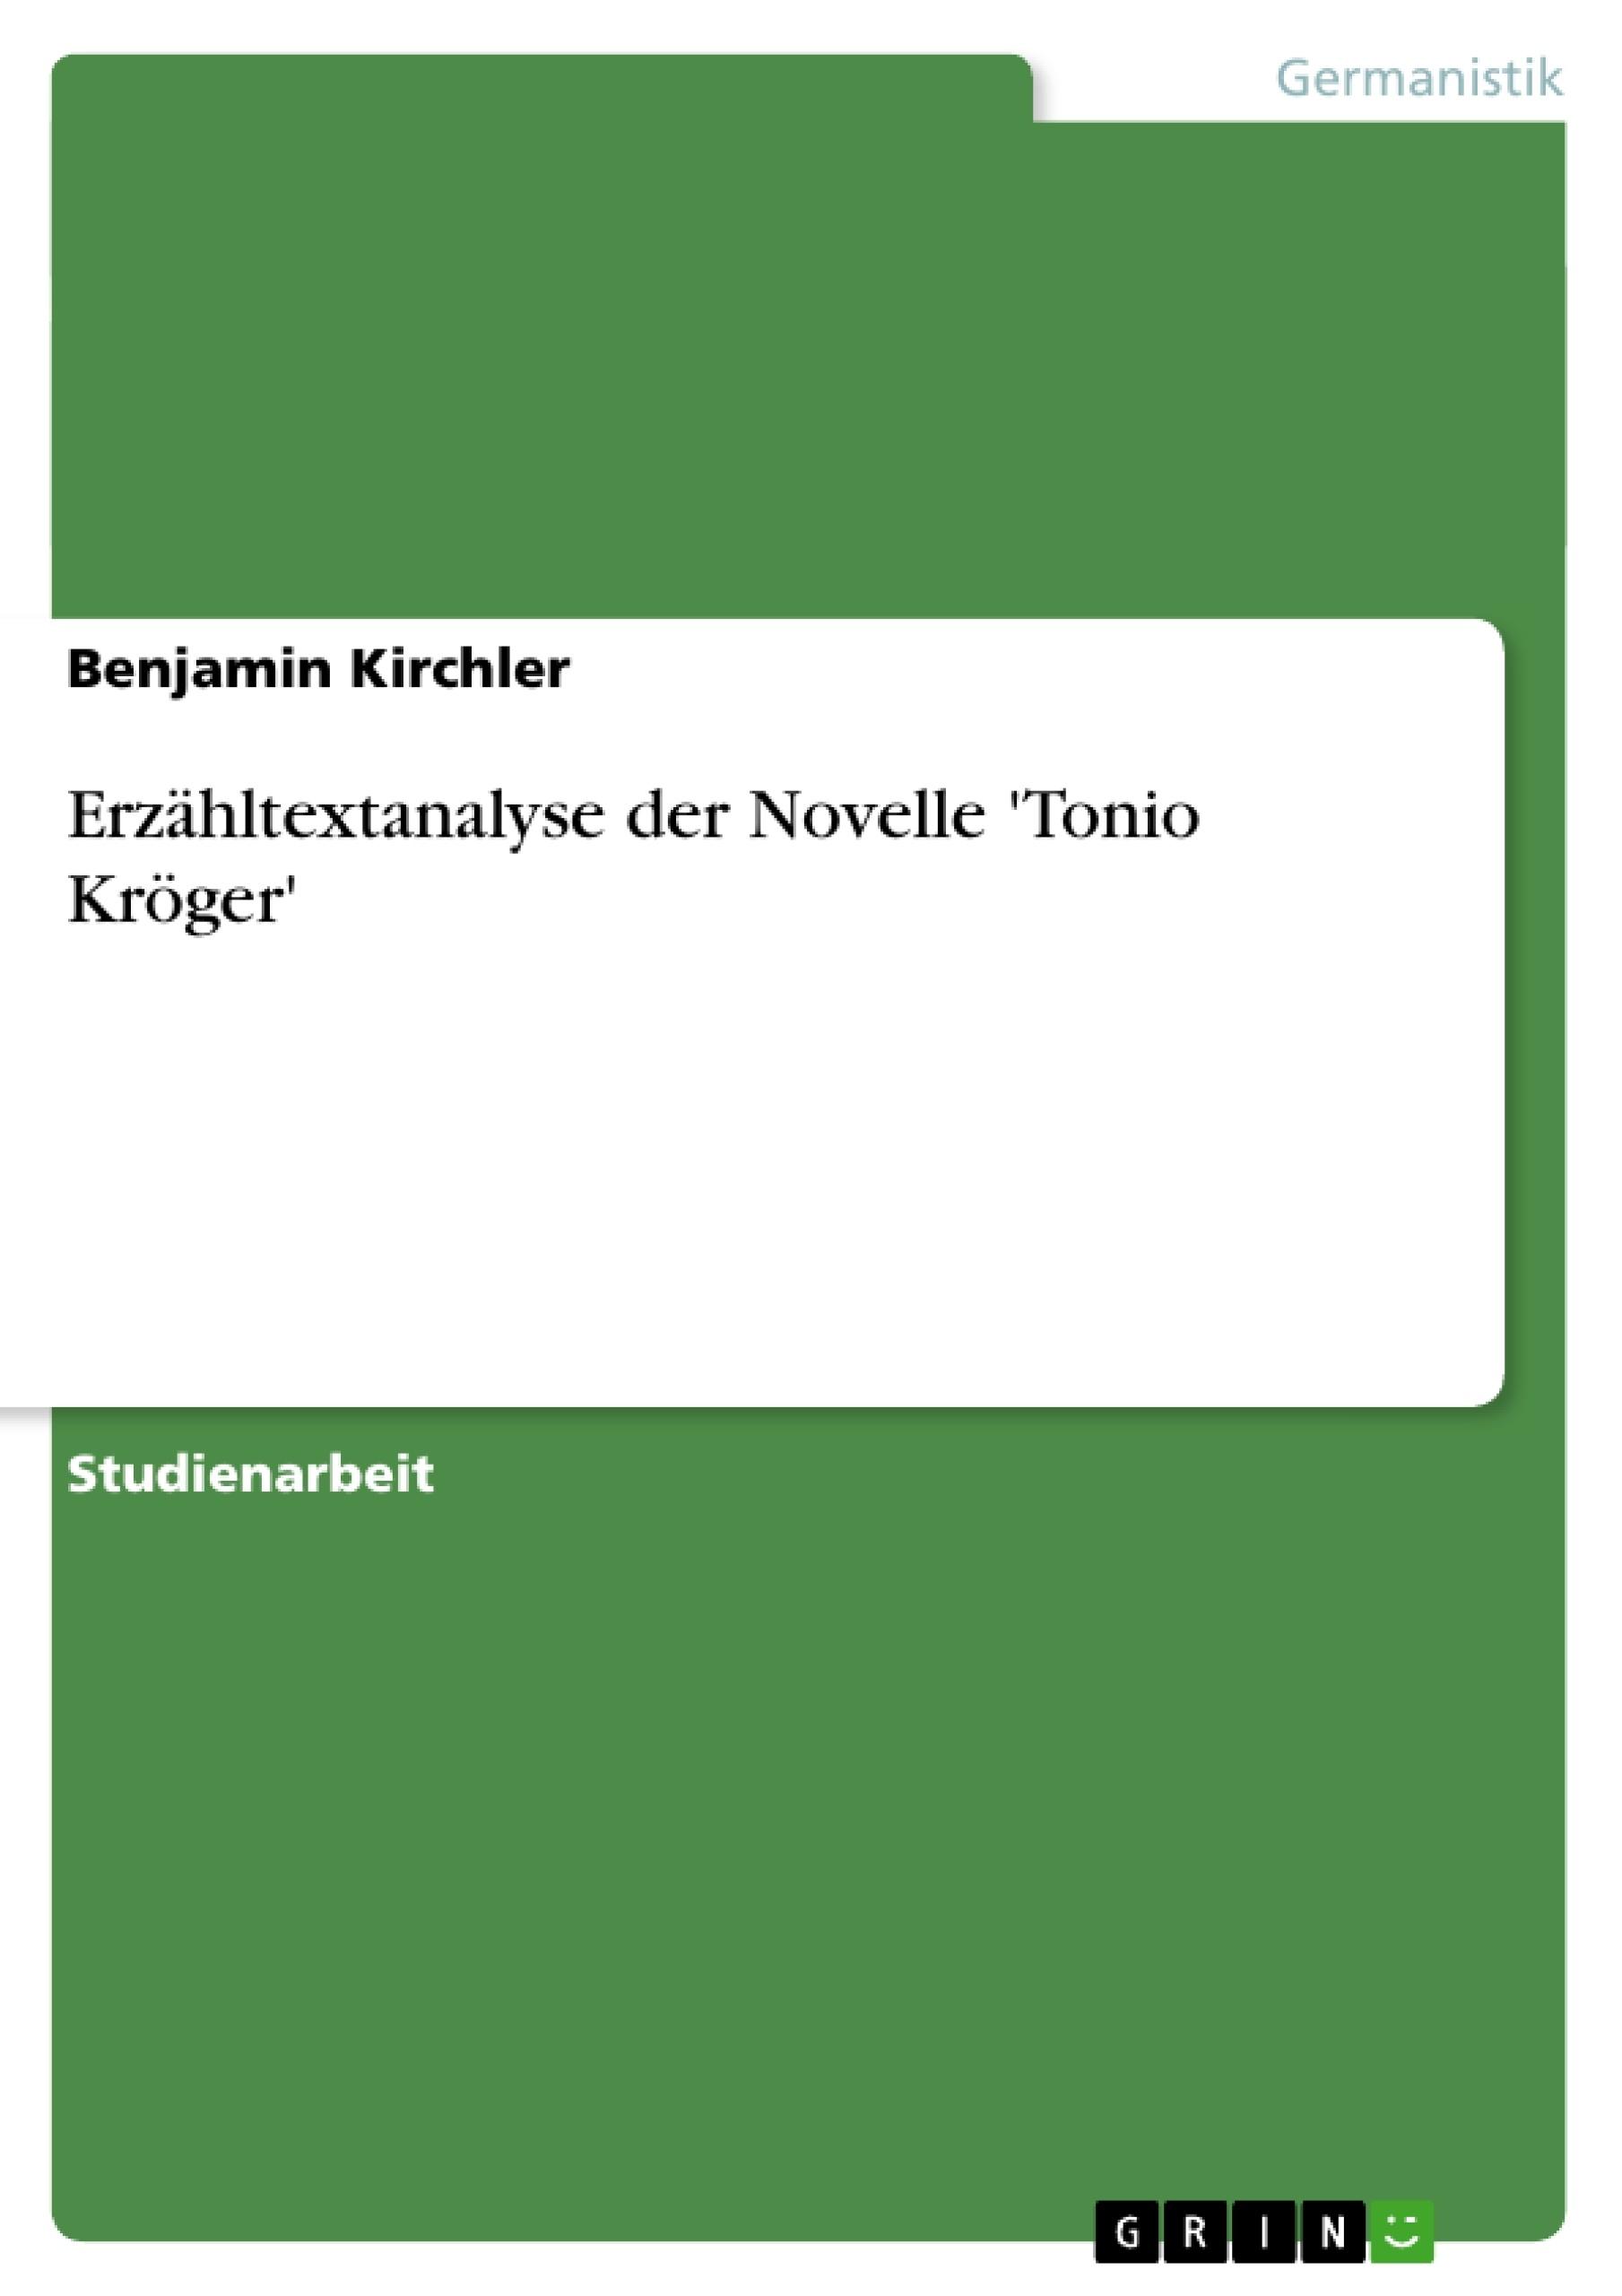 Titel: Erzähltextanalyse der Novelle 'Tonio Kröger'